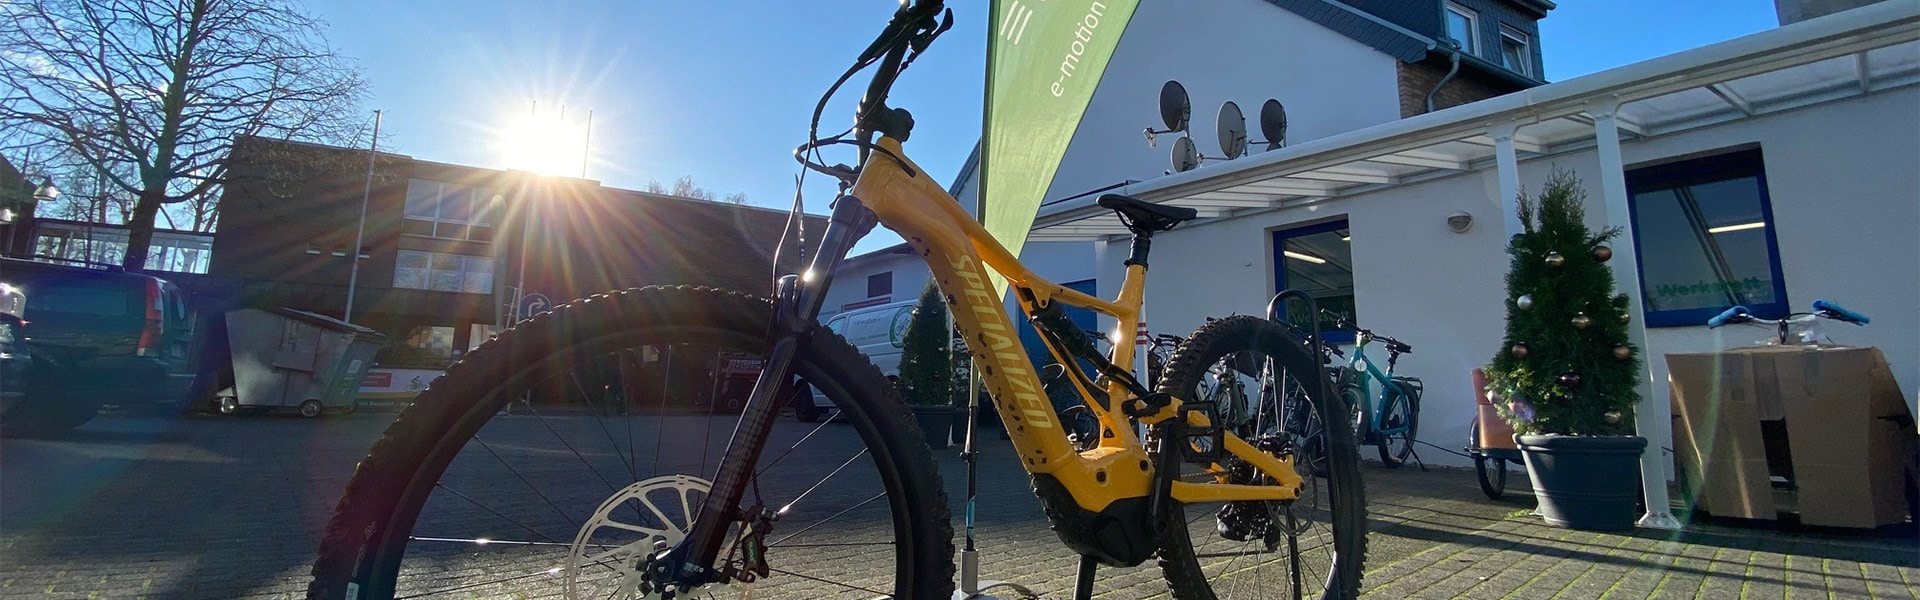 Titelbild e-motion e-Bike Welt Tönisvorst Außen